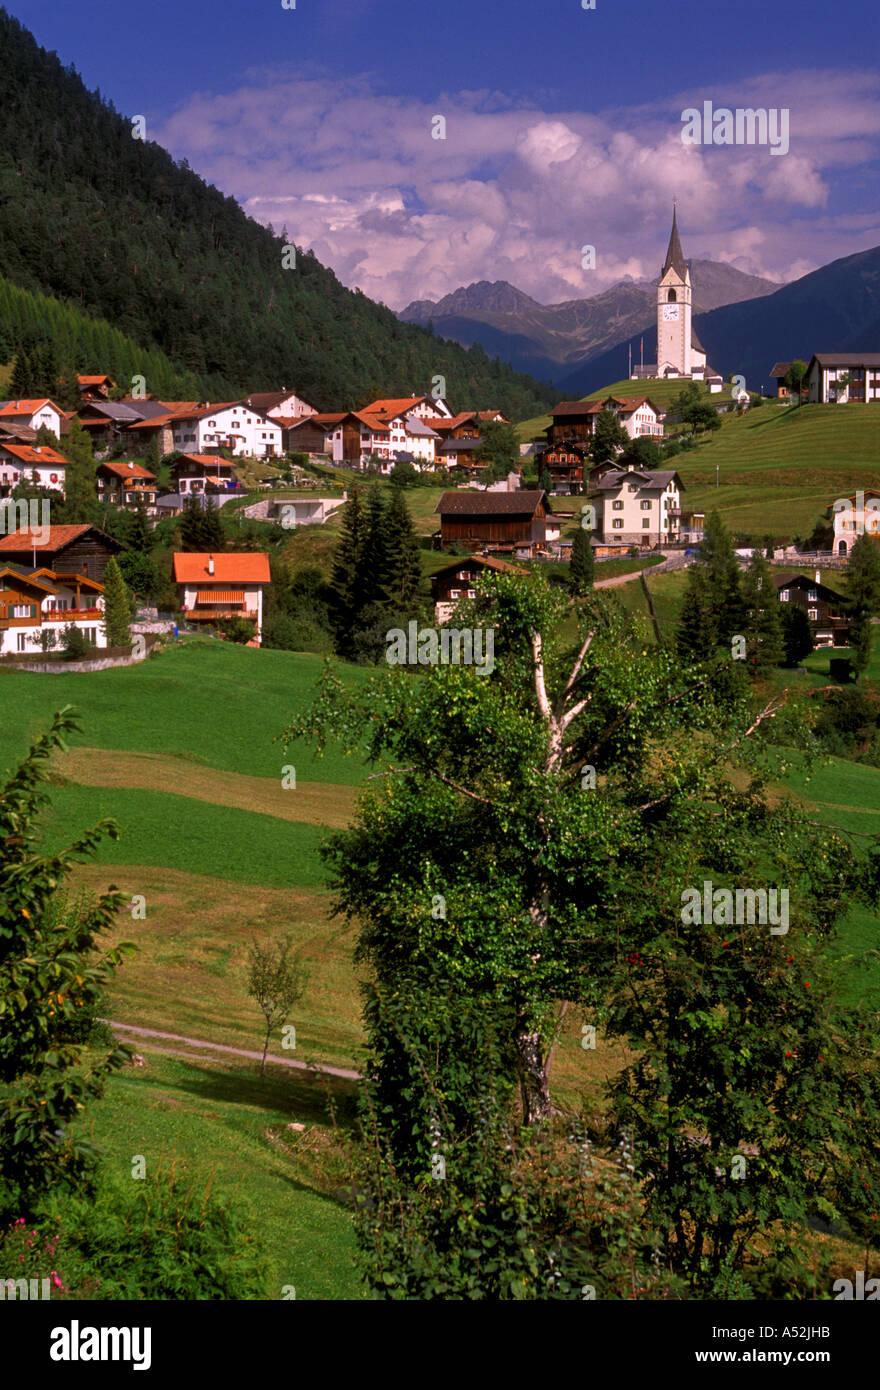 Mountain landscape Schmitten Graubunden Canton Switzerland Europe Stock Photo